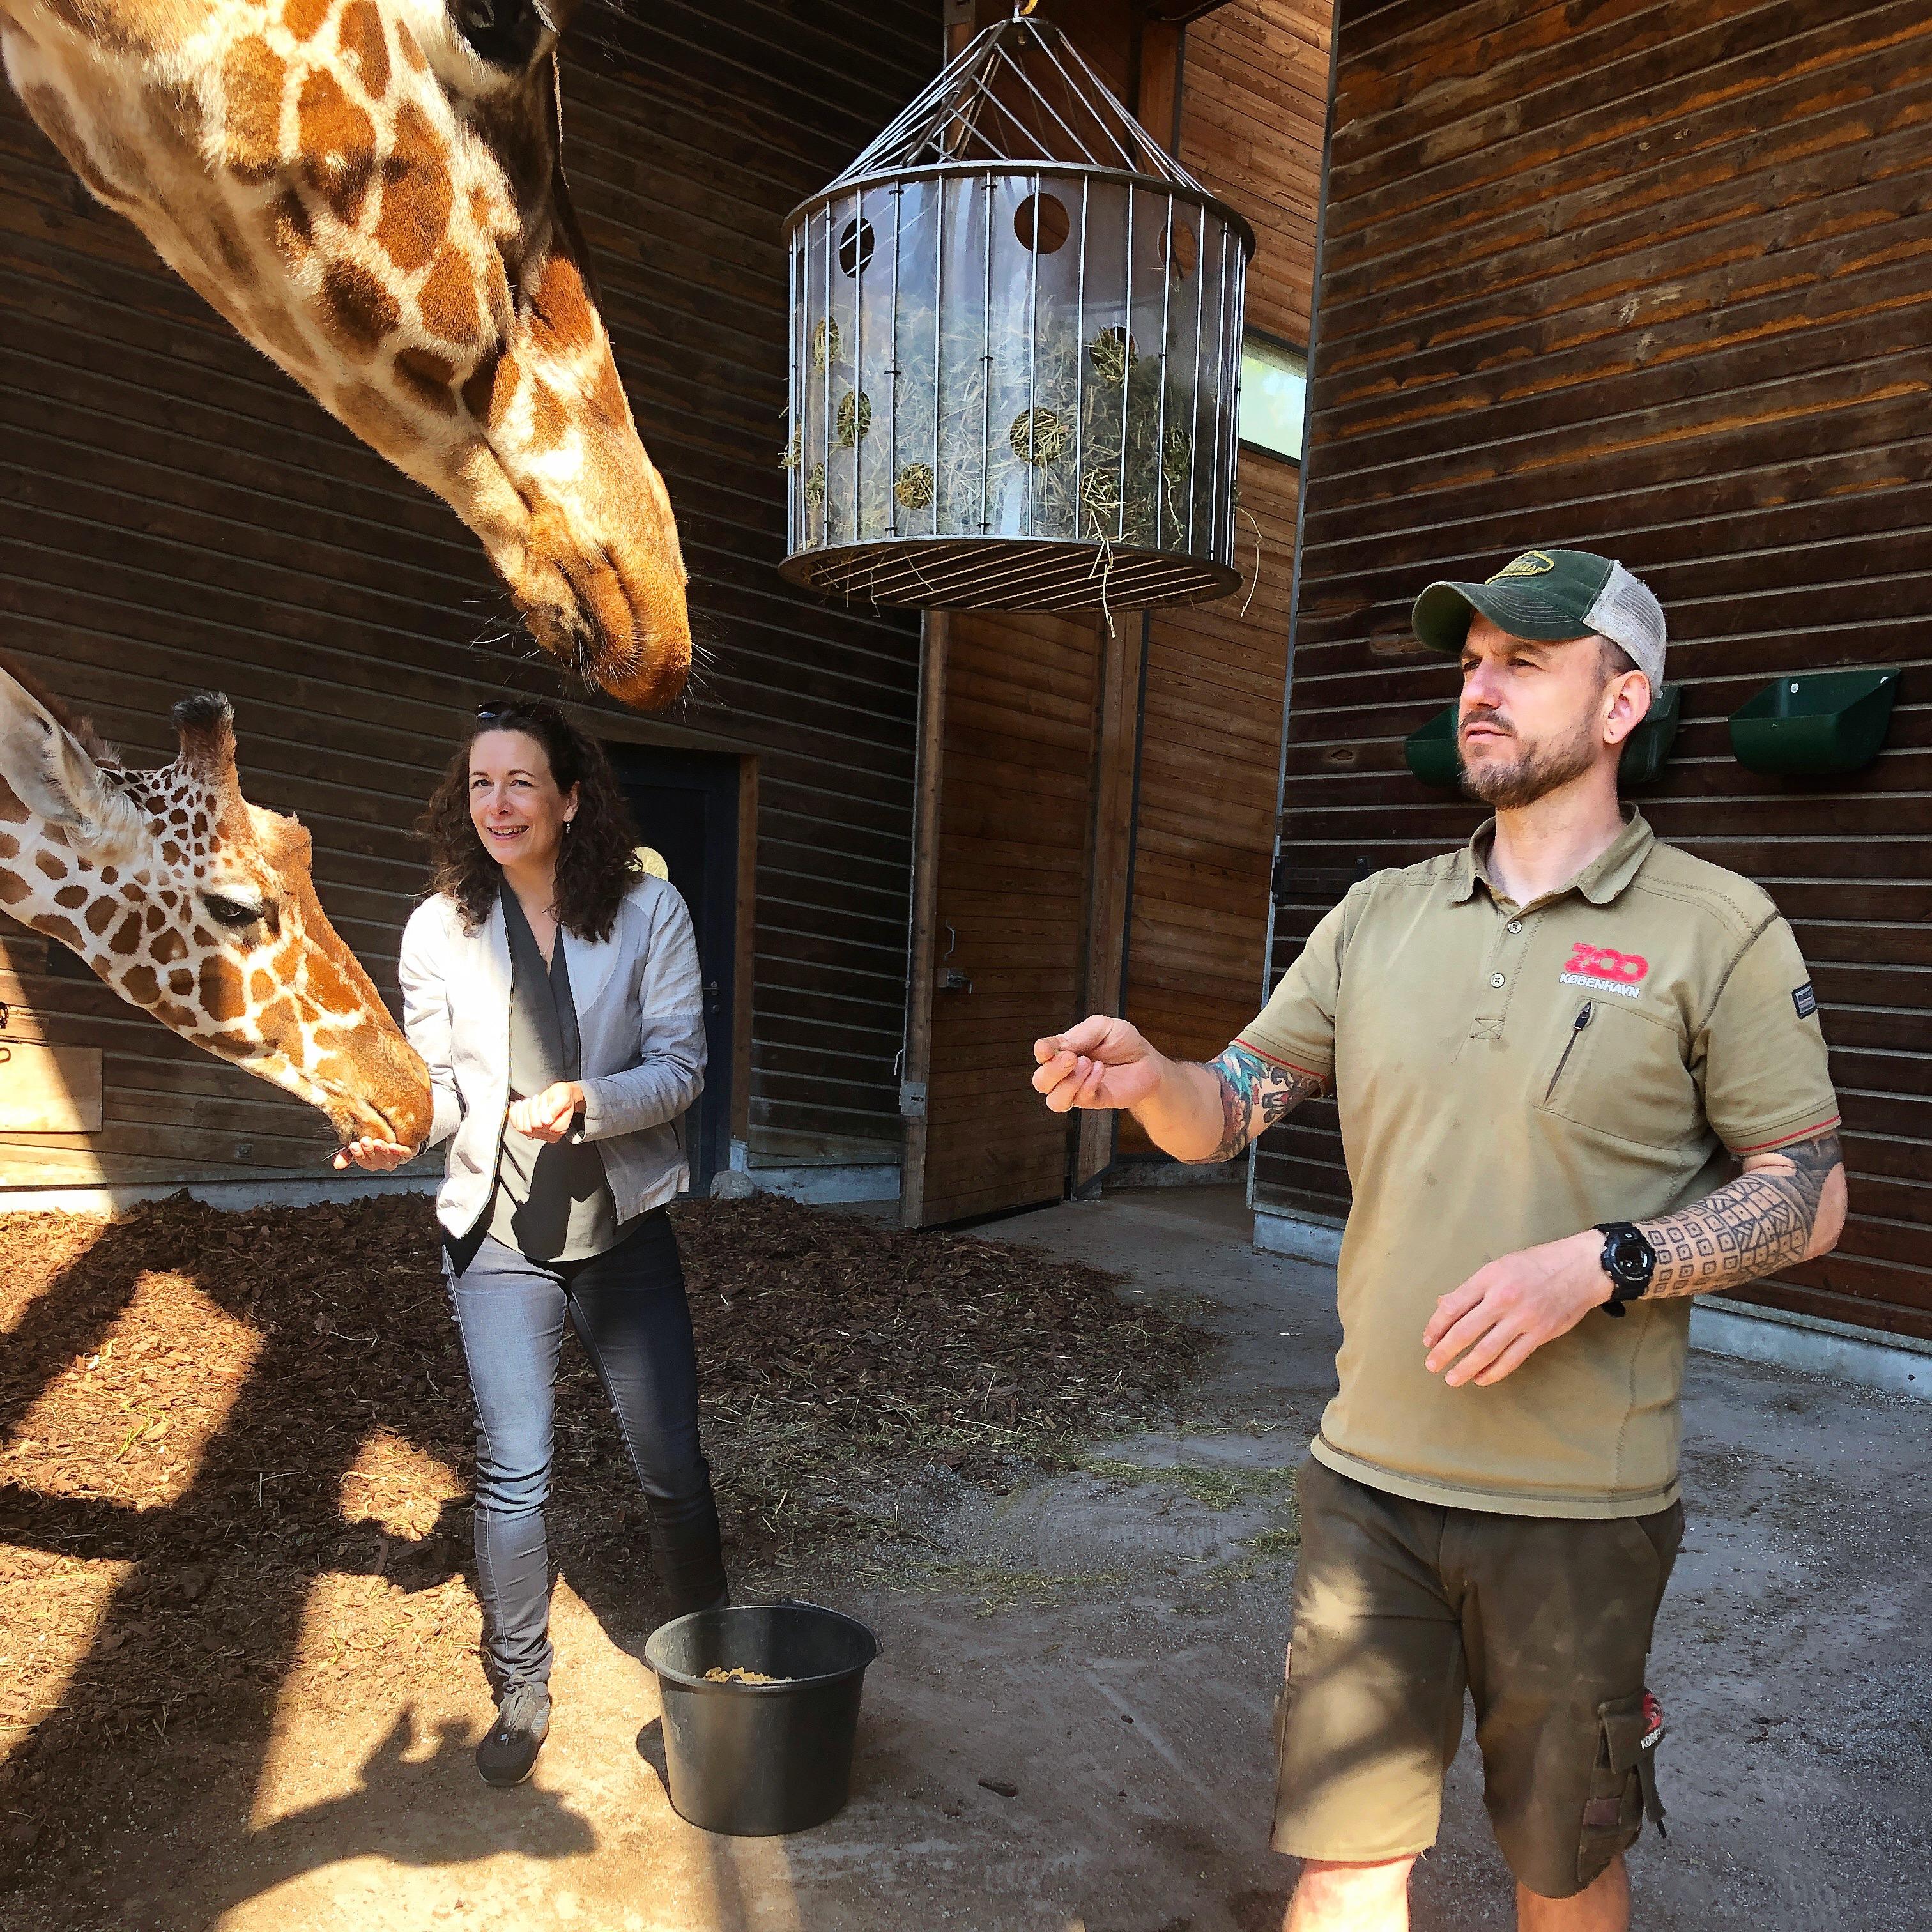 Brian aka Zookeeperguy på Instagram